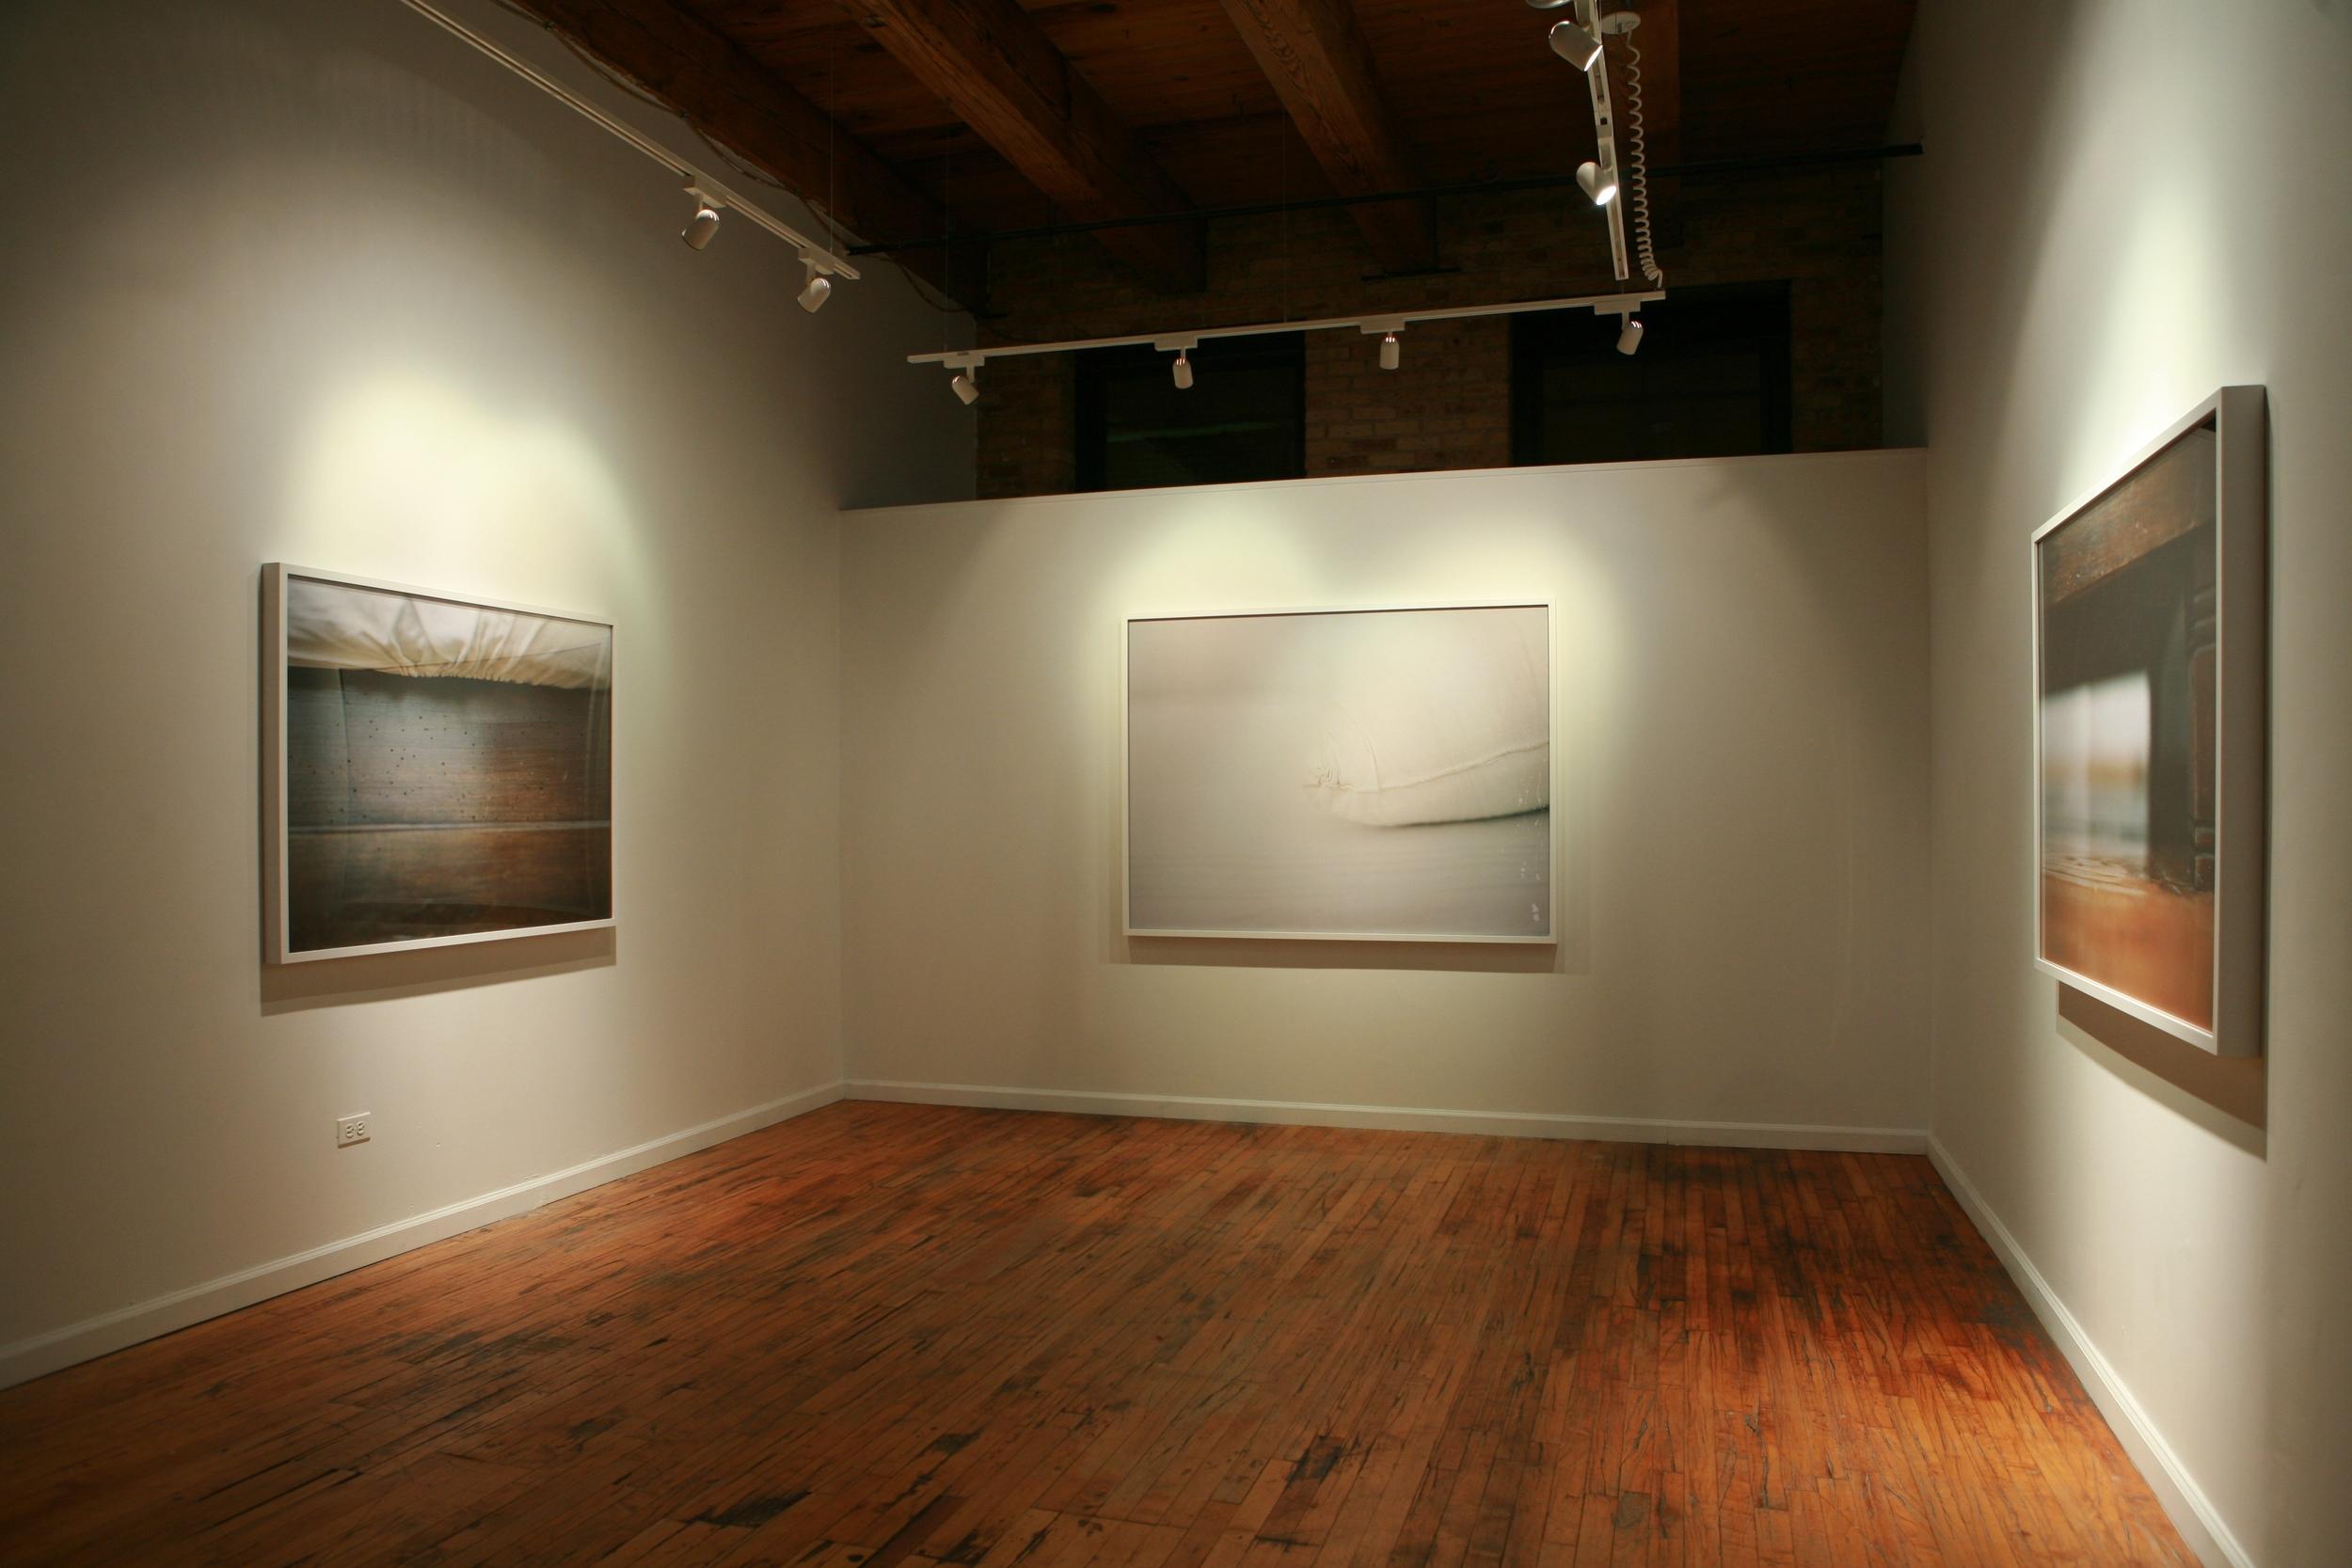 Installation Views , ThreeWalls Gallery, Chicago, 2007